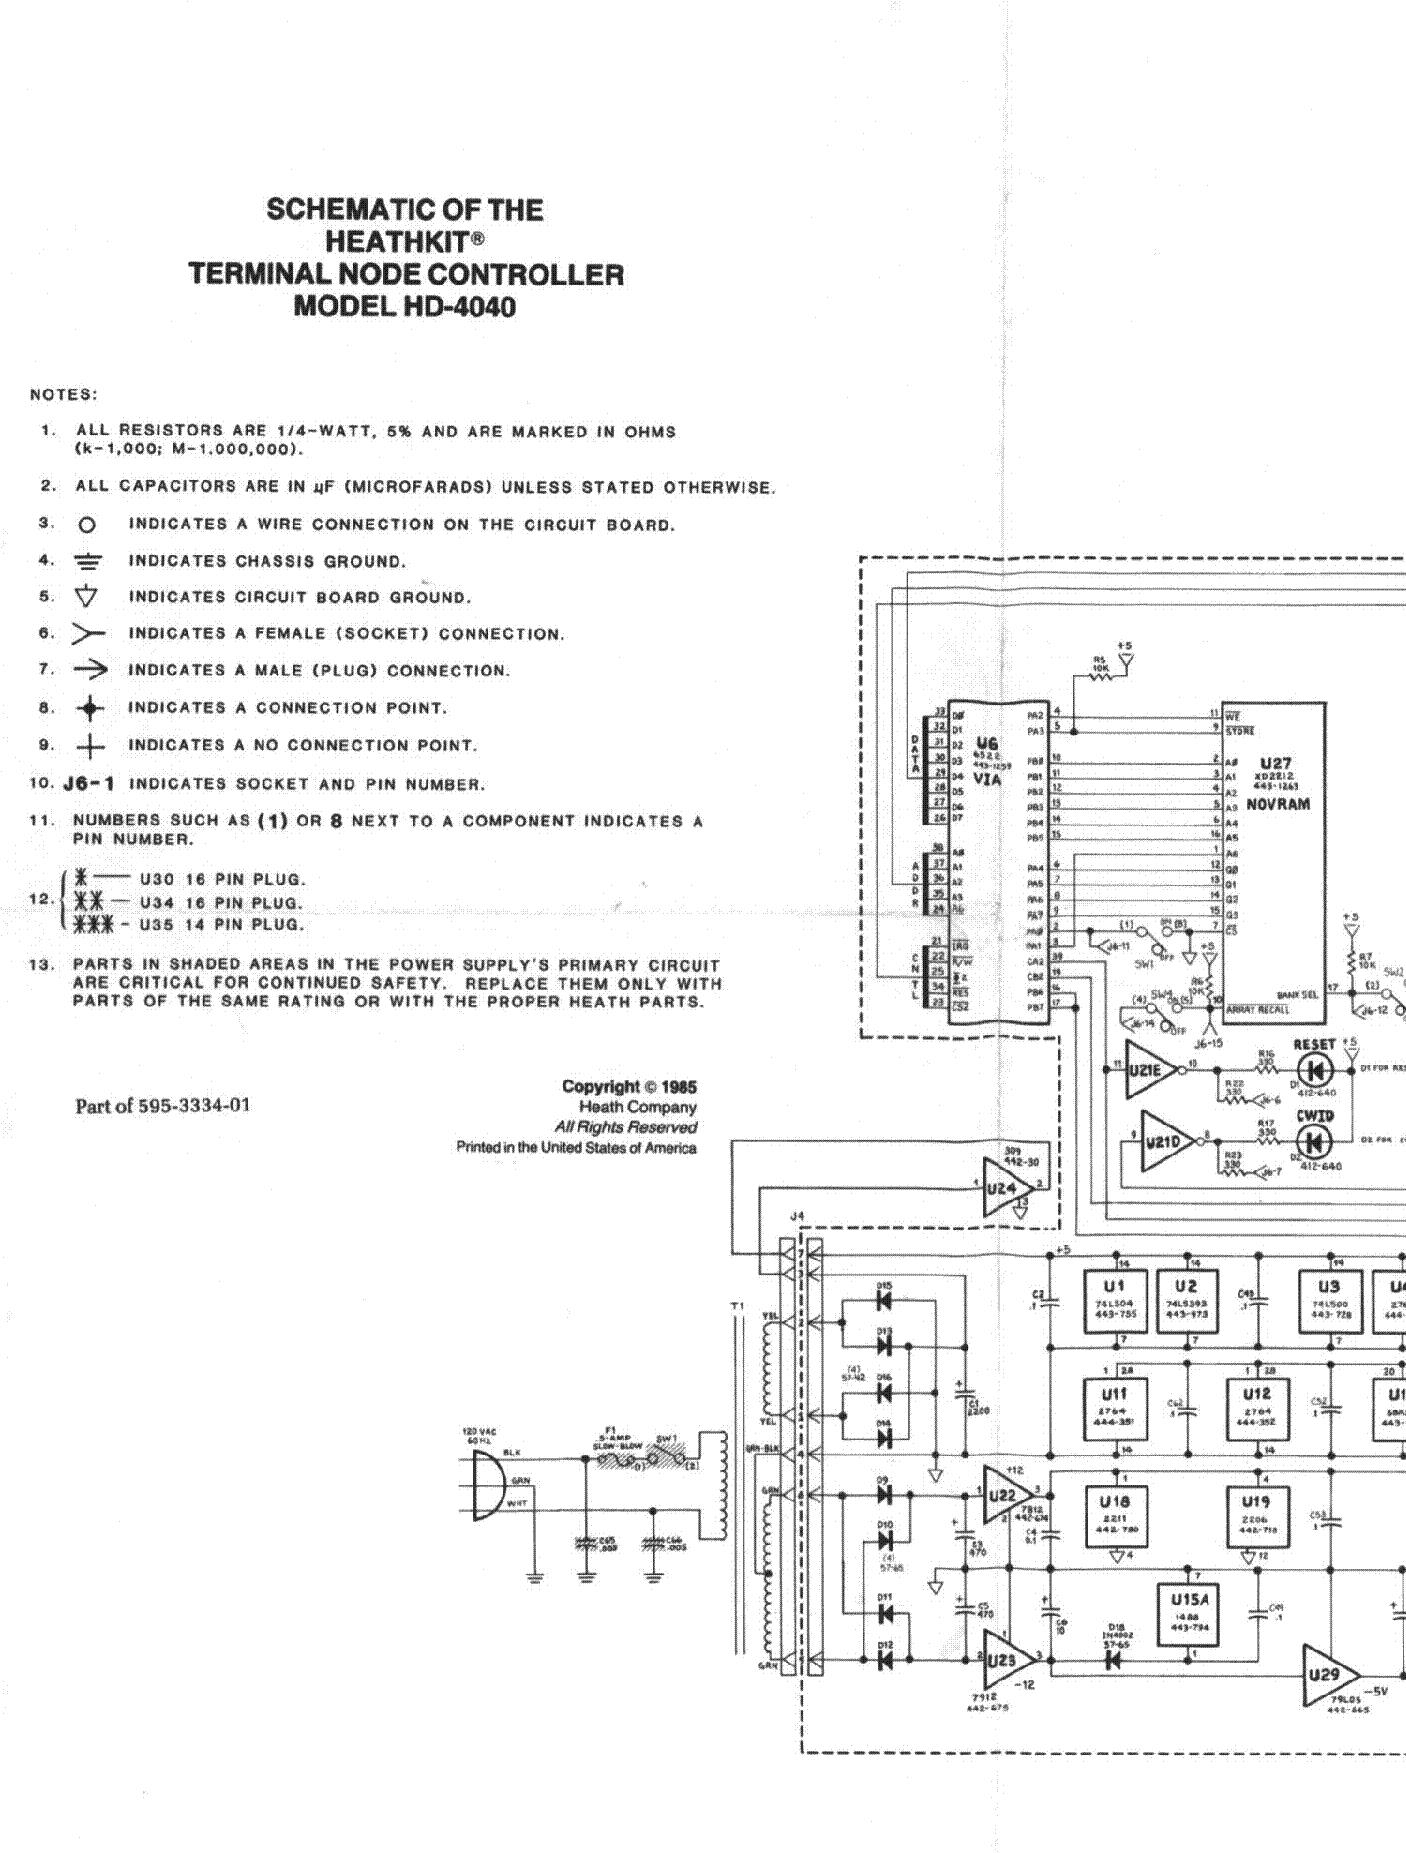 HEATHKIT HD-4040 TERMINAL NODE CONTROLLER SM service manual (2nd page)